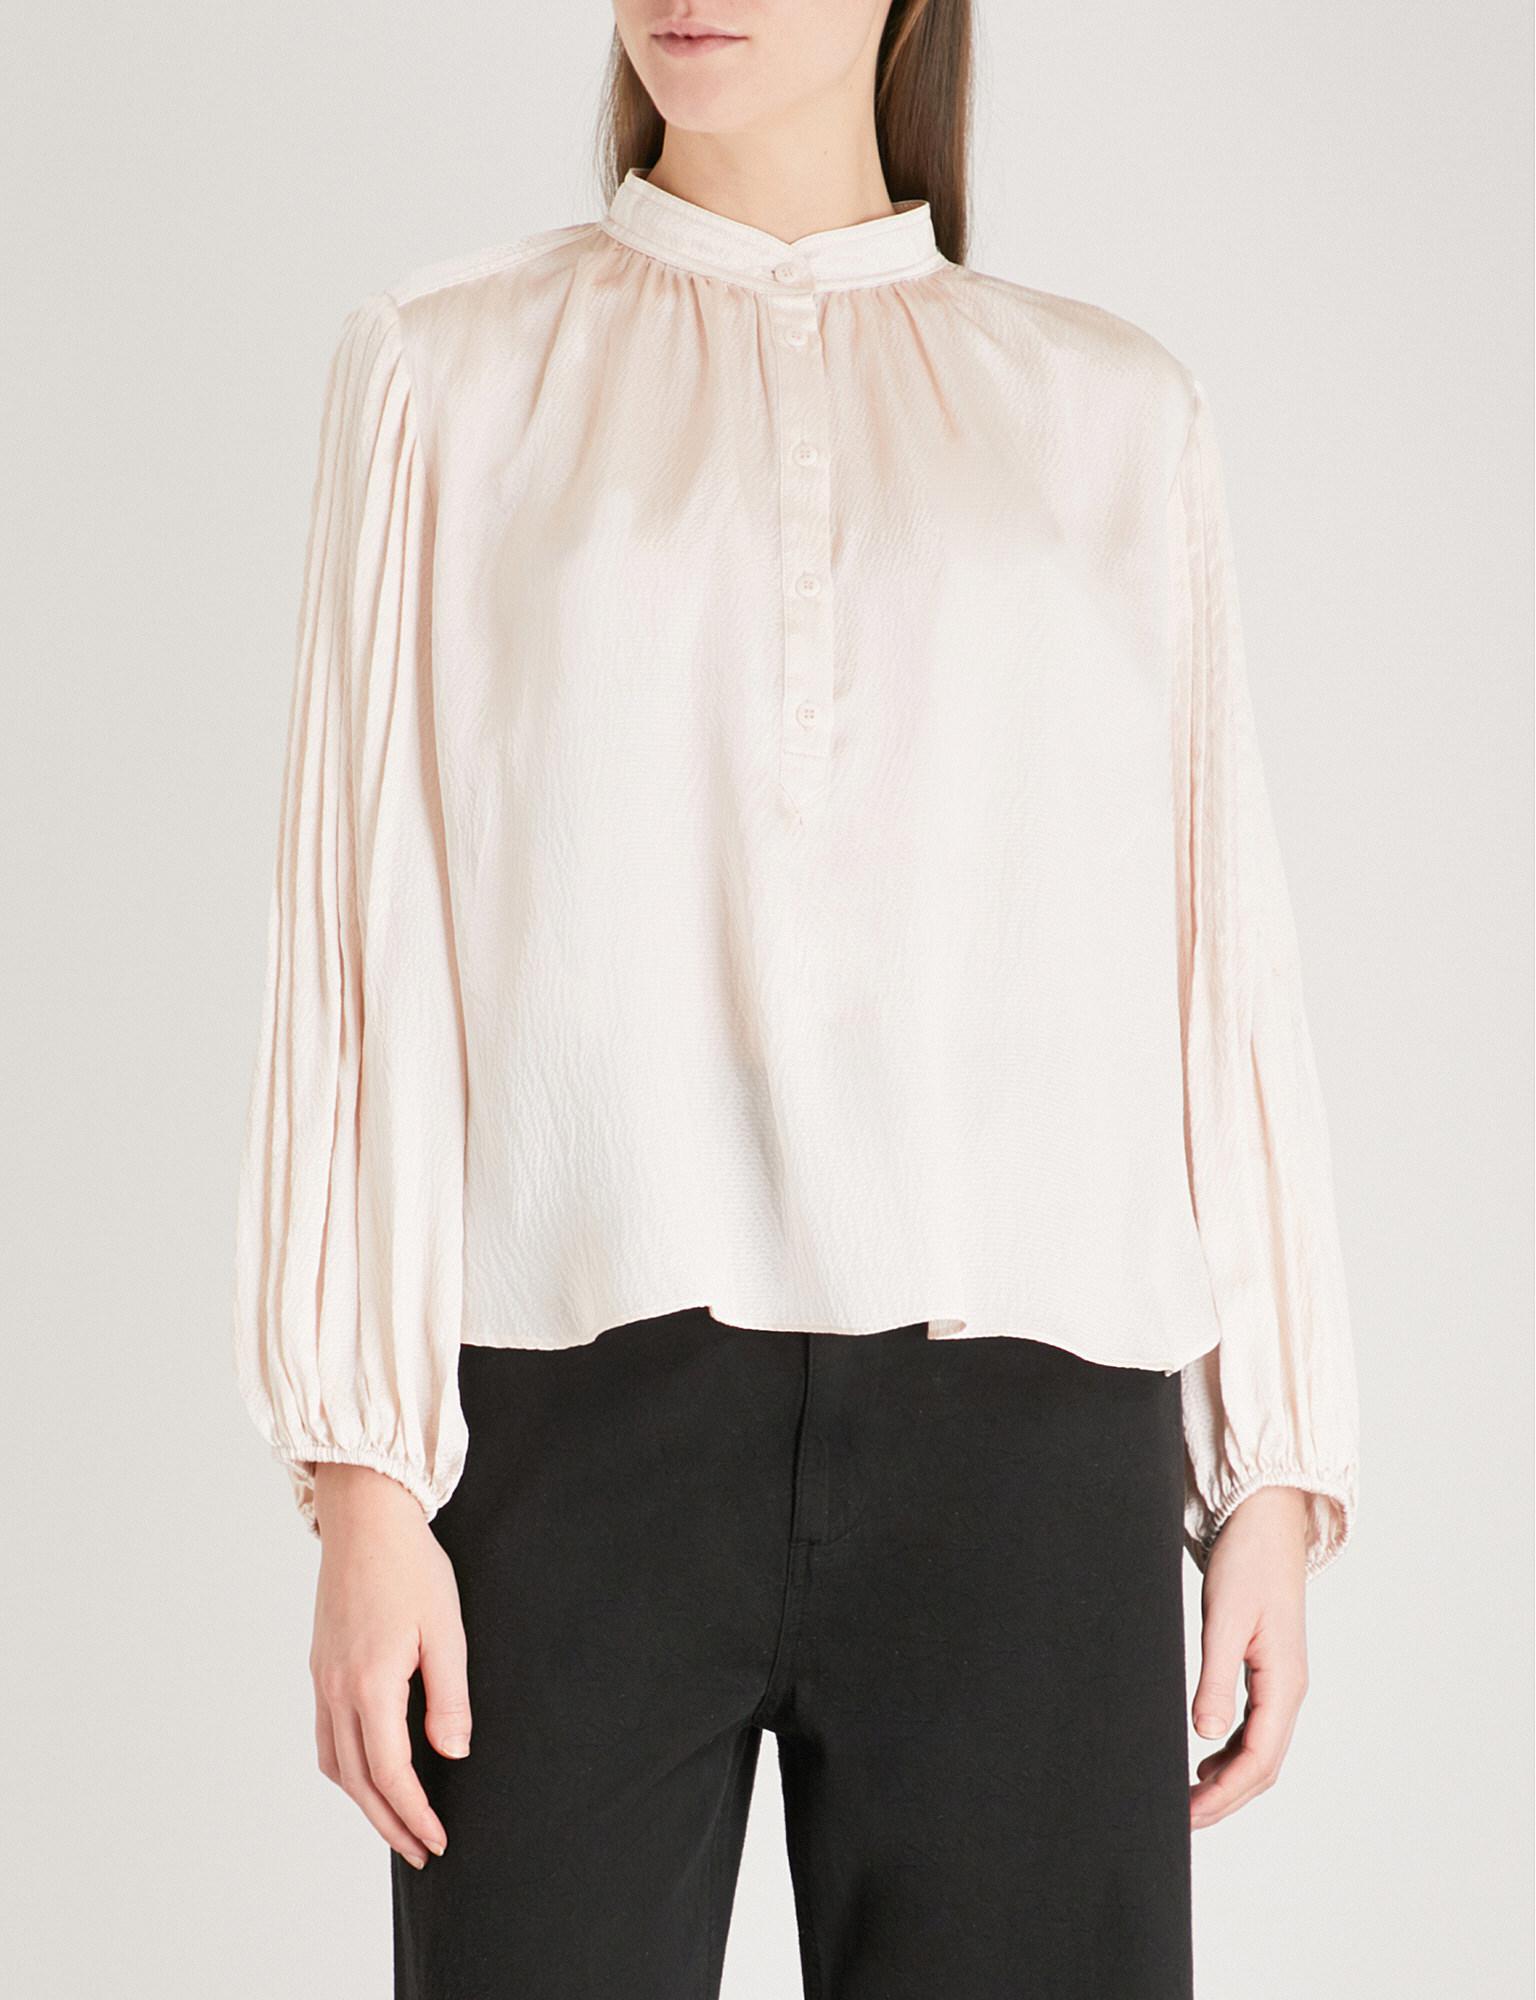 46815893dee199 Apiece Apart Bravo Silk-satin Blouse in White - Lyst